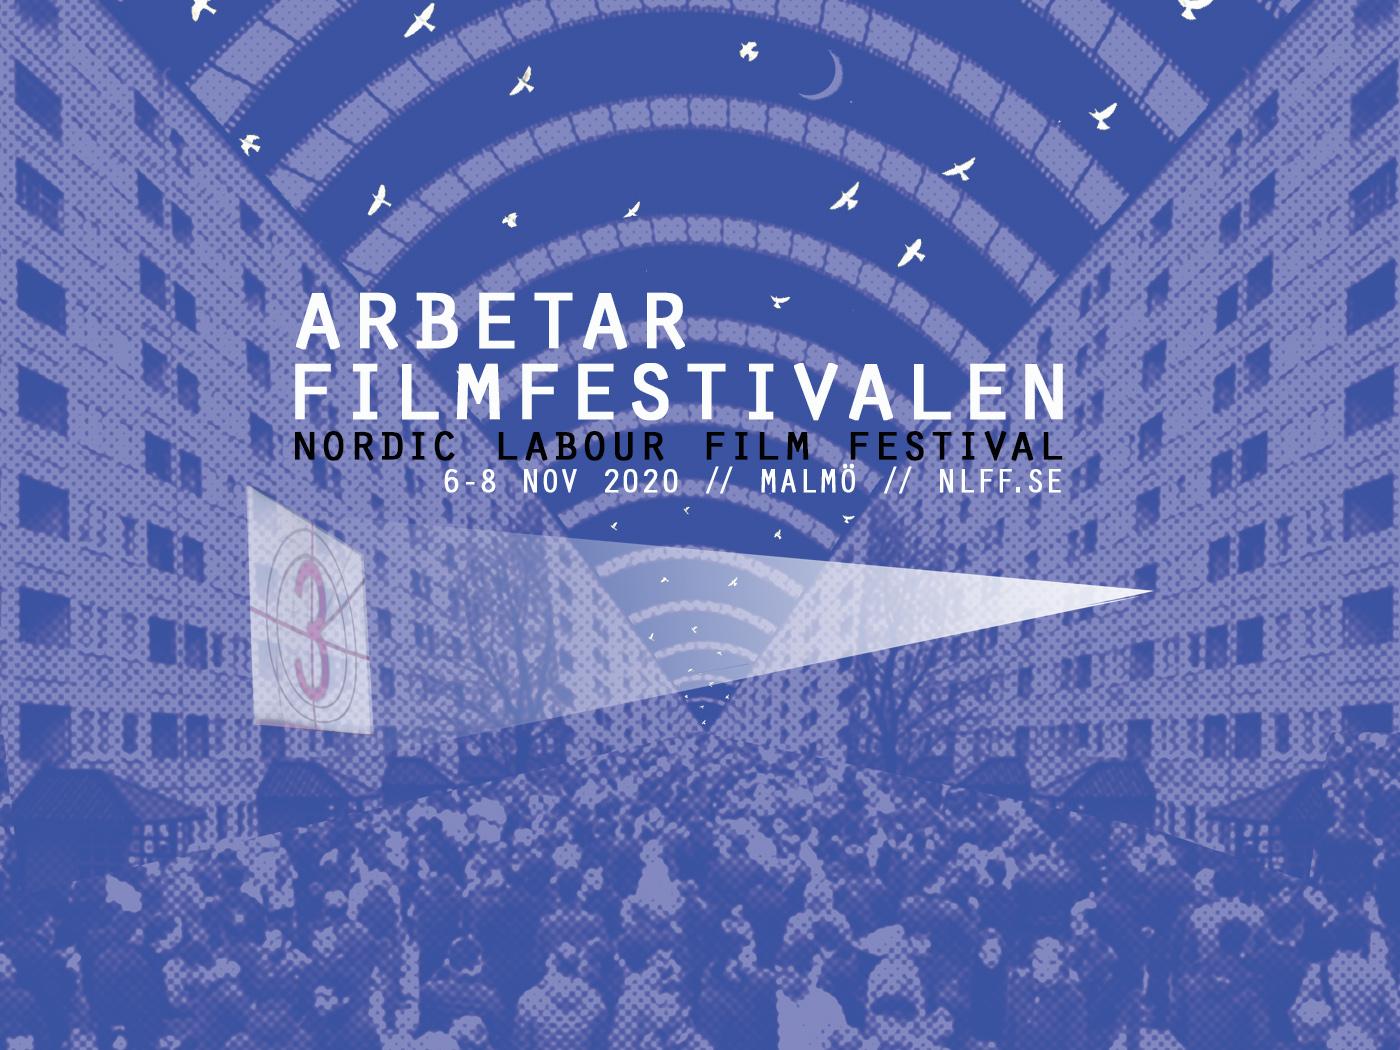 Arbetar Filmfestivalen 2020 // Nordic Labour Film Festival 2020